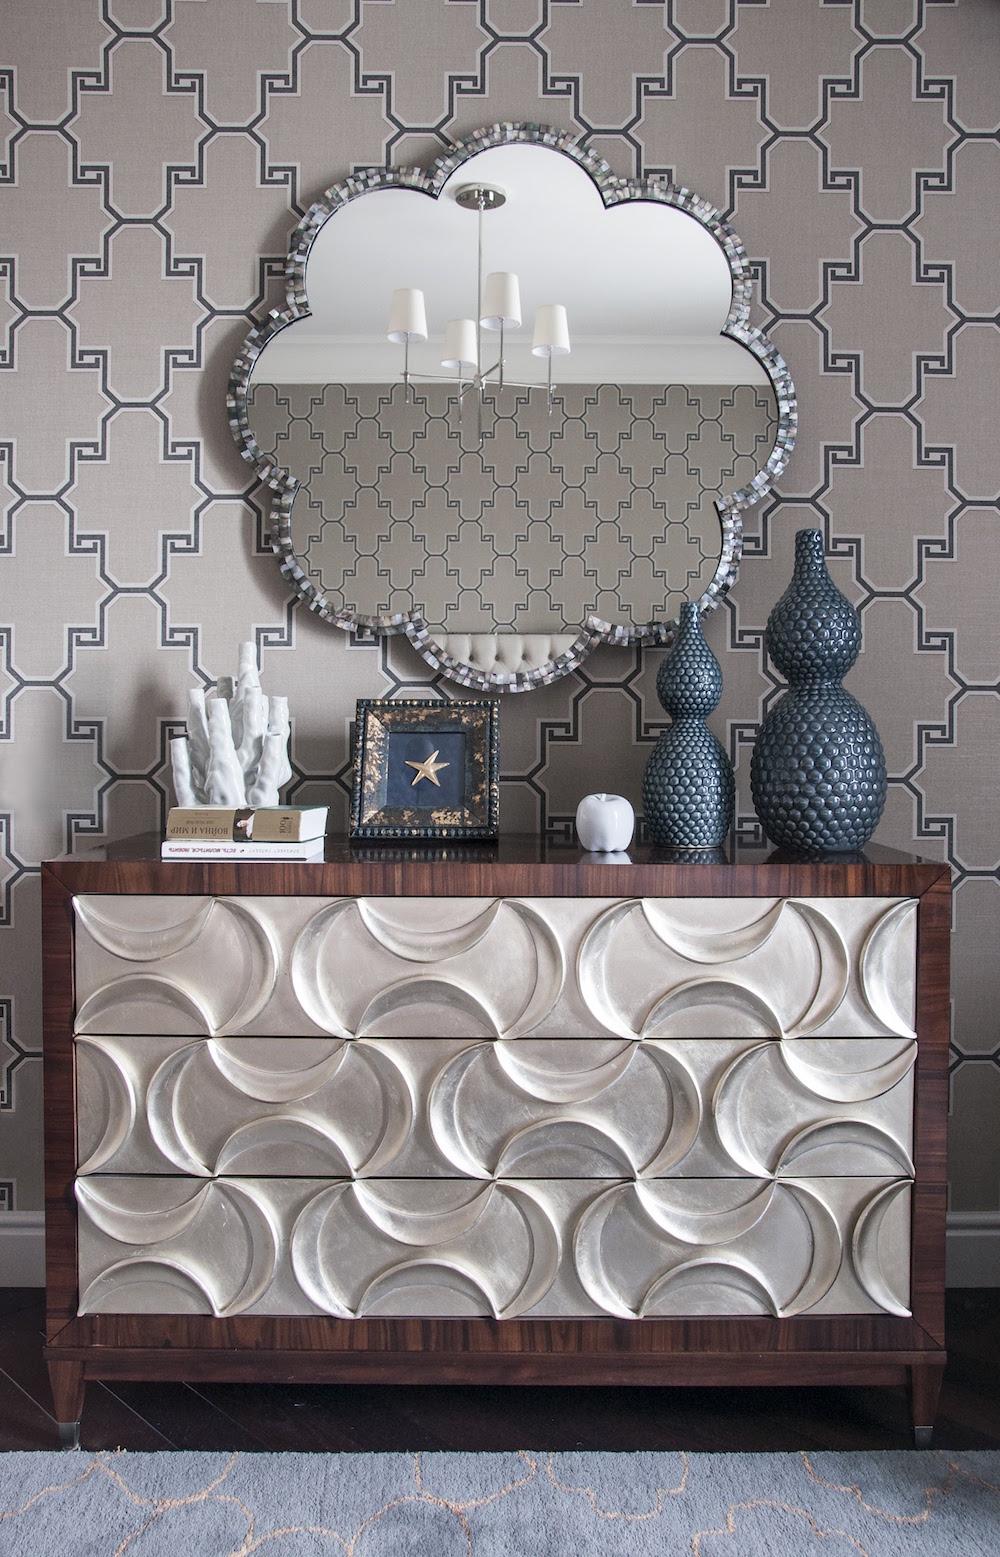 Art decor apartment bedroom dresser